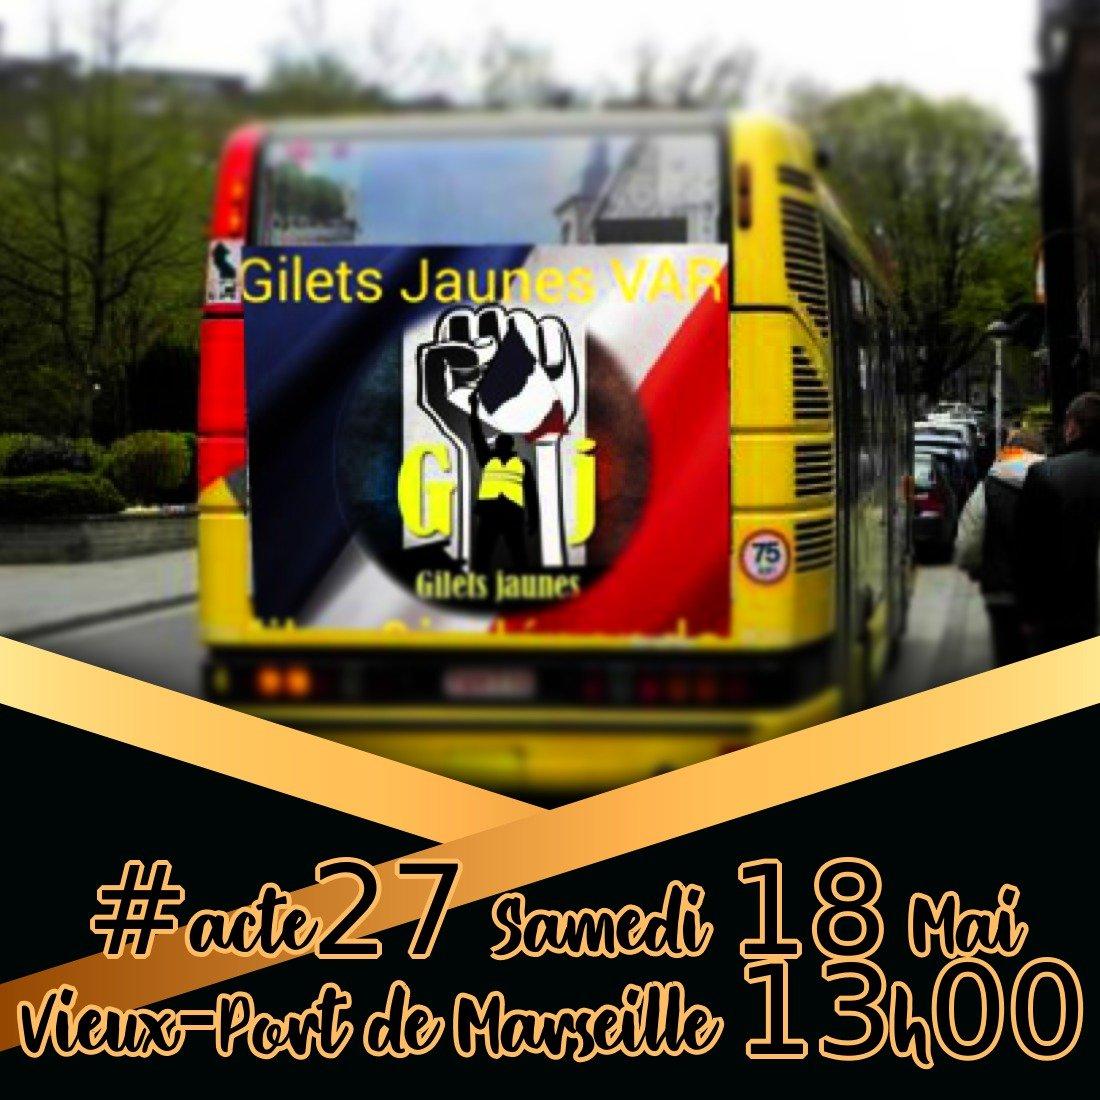 #giletsjaunes #GiletsJaunes83 On Tour #Marseille #acte27 #yellowvests #MacronDemission #MacronCompliceDuPire @GiletsJaunesGo @gjtv83 @PartisanDE @Zaelyah @NowakAnnie2 @mecnormal13 <br>http://pic.twitter.com/erVuBu49yZ